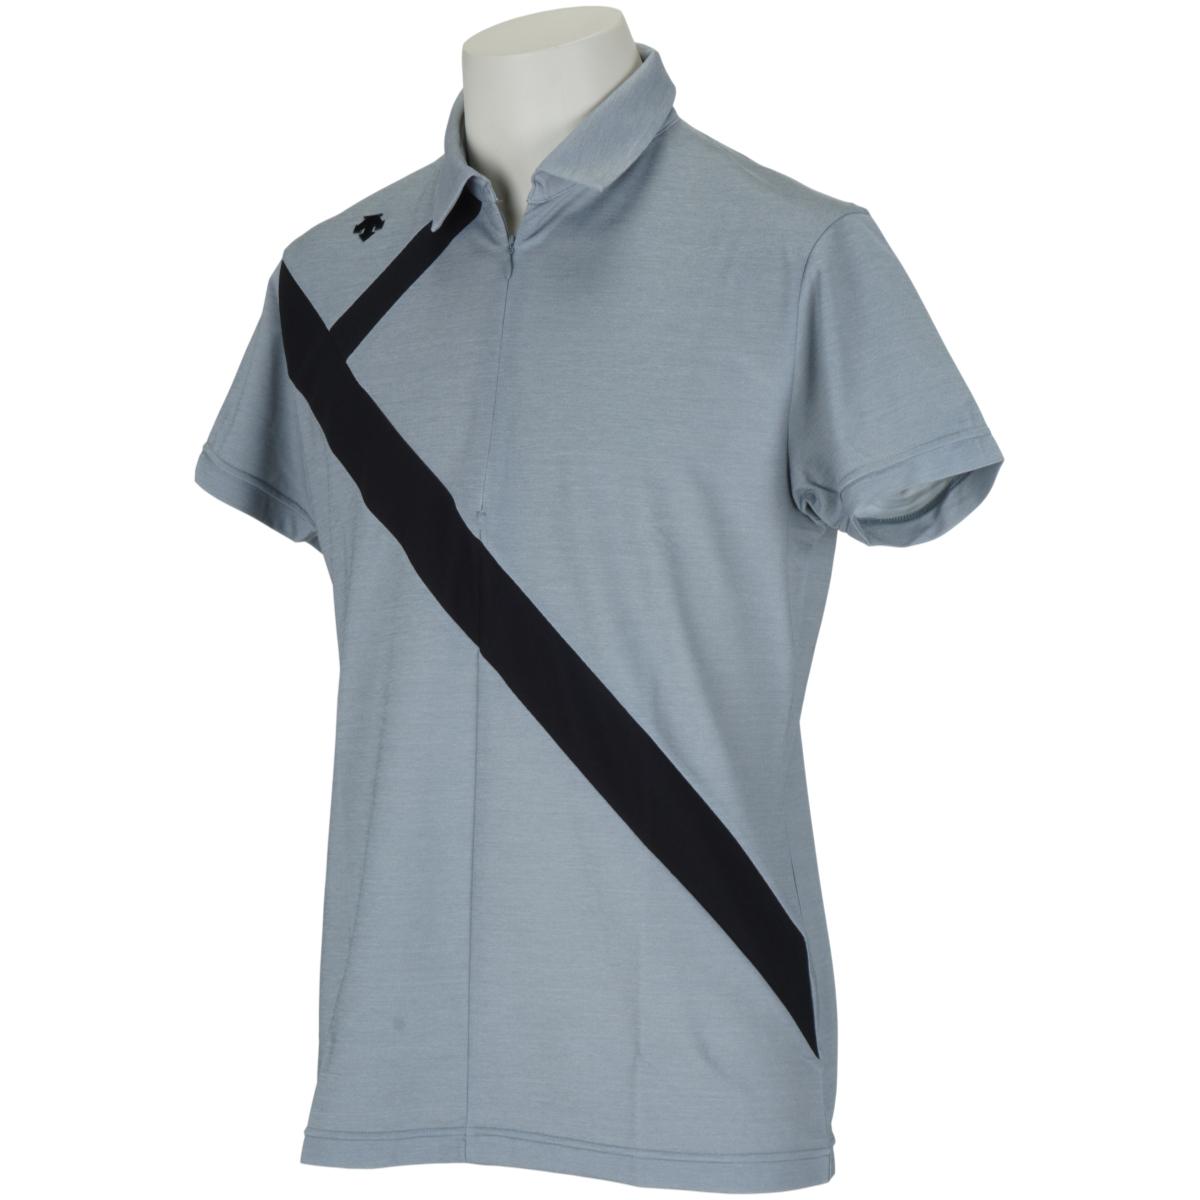 ECOアクセンシャルゼブラ鹿の子切り替え 半袖ポロシャツ